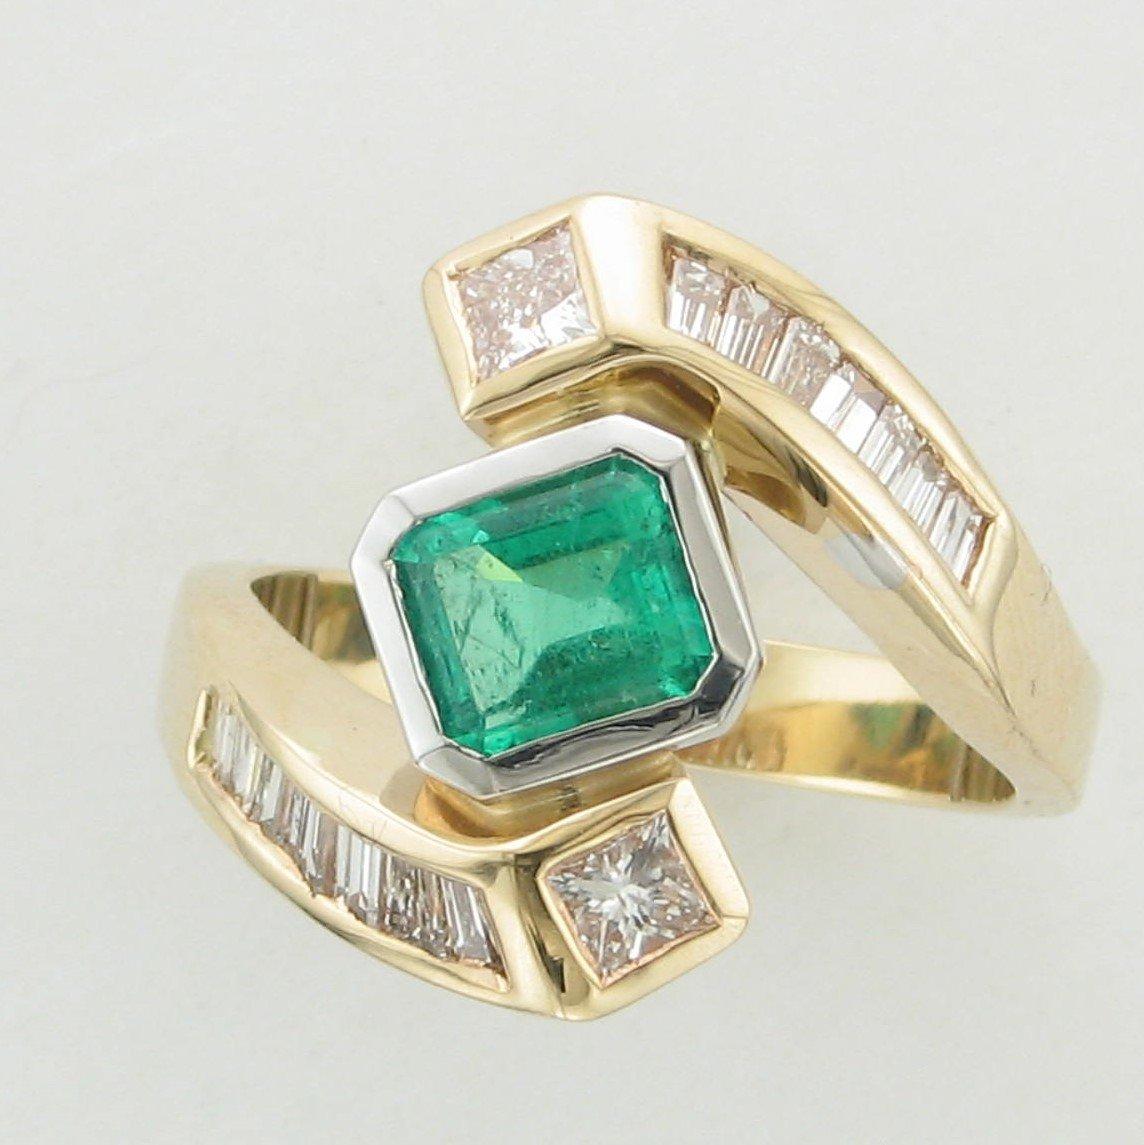 1.09ct Emerald & Diamond Ring set in 14k Yellow Gold